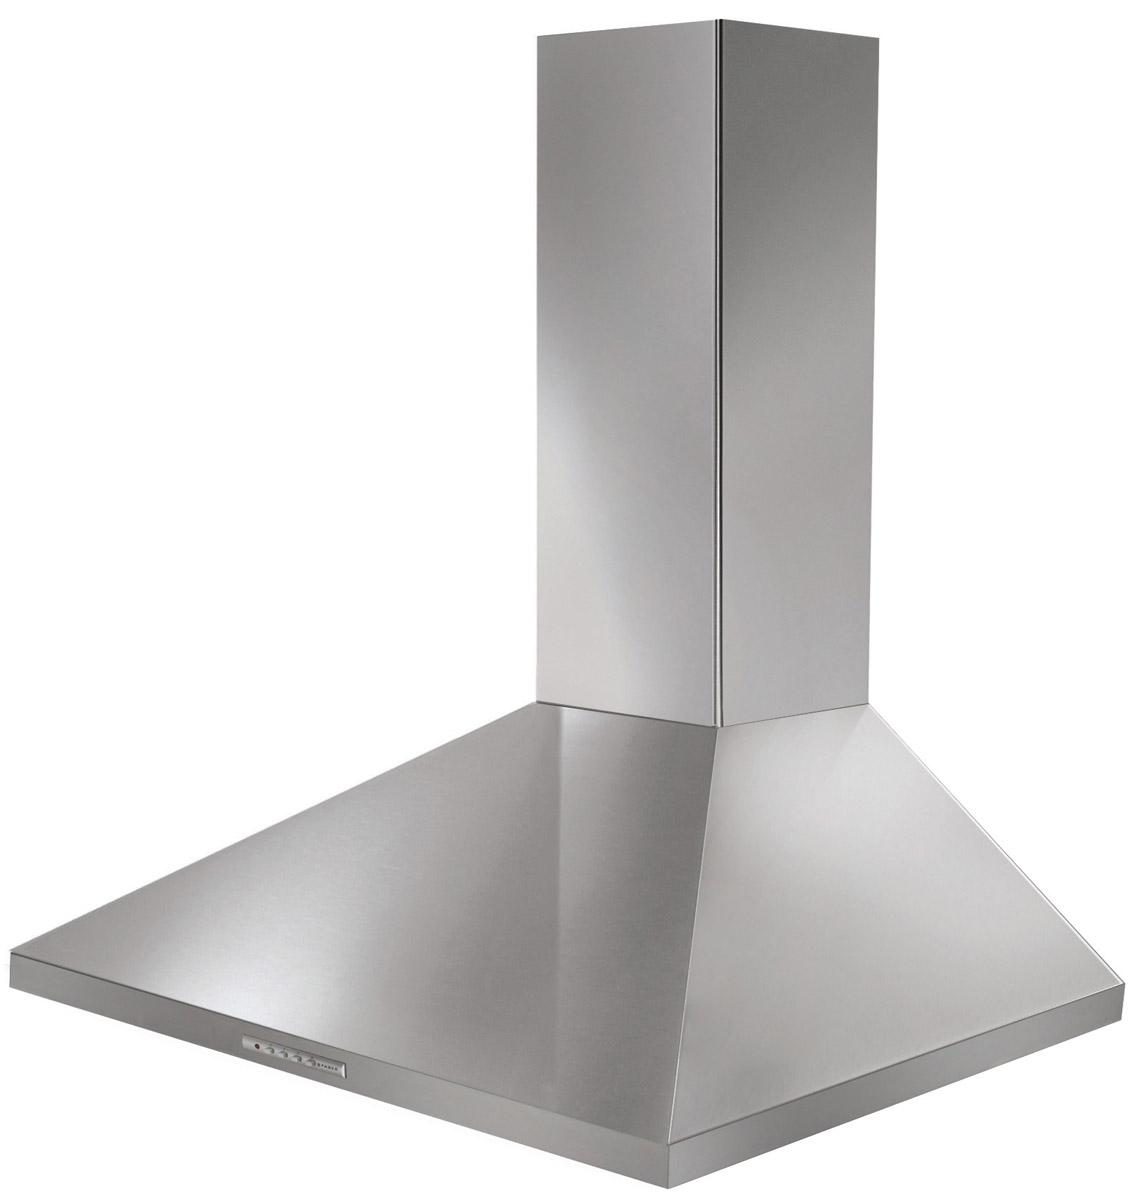 Faber Value PB 4 2L A60, Steel вытяжка110.0267.618